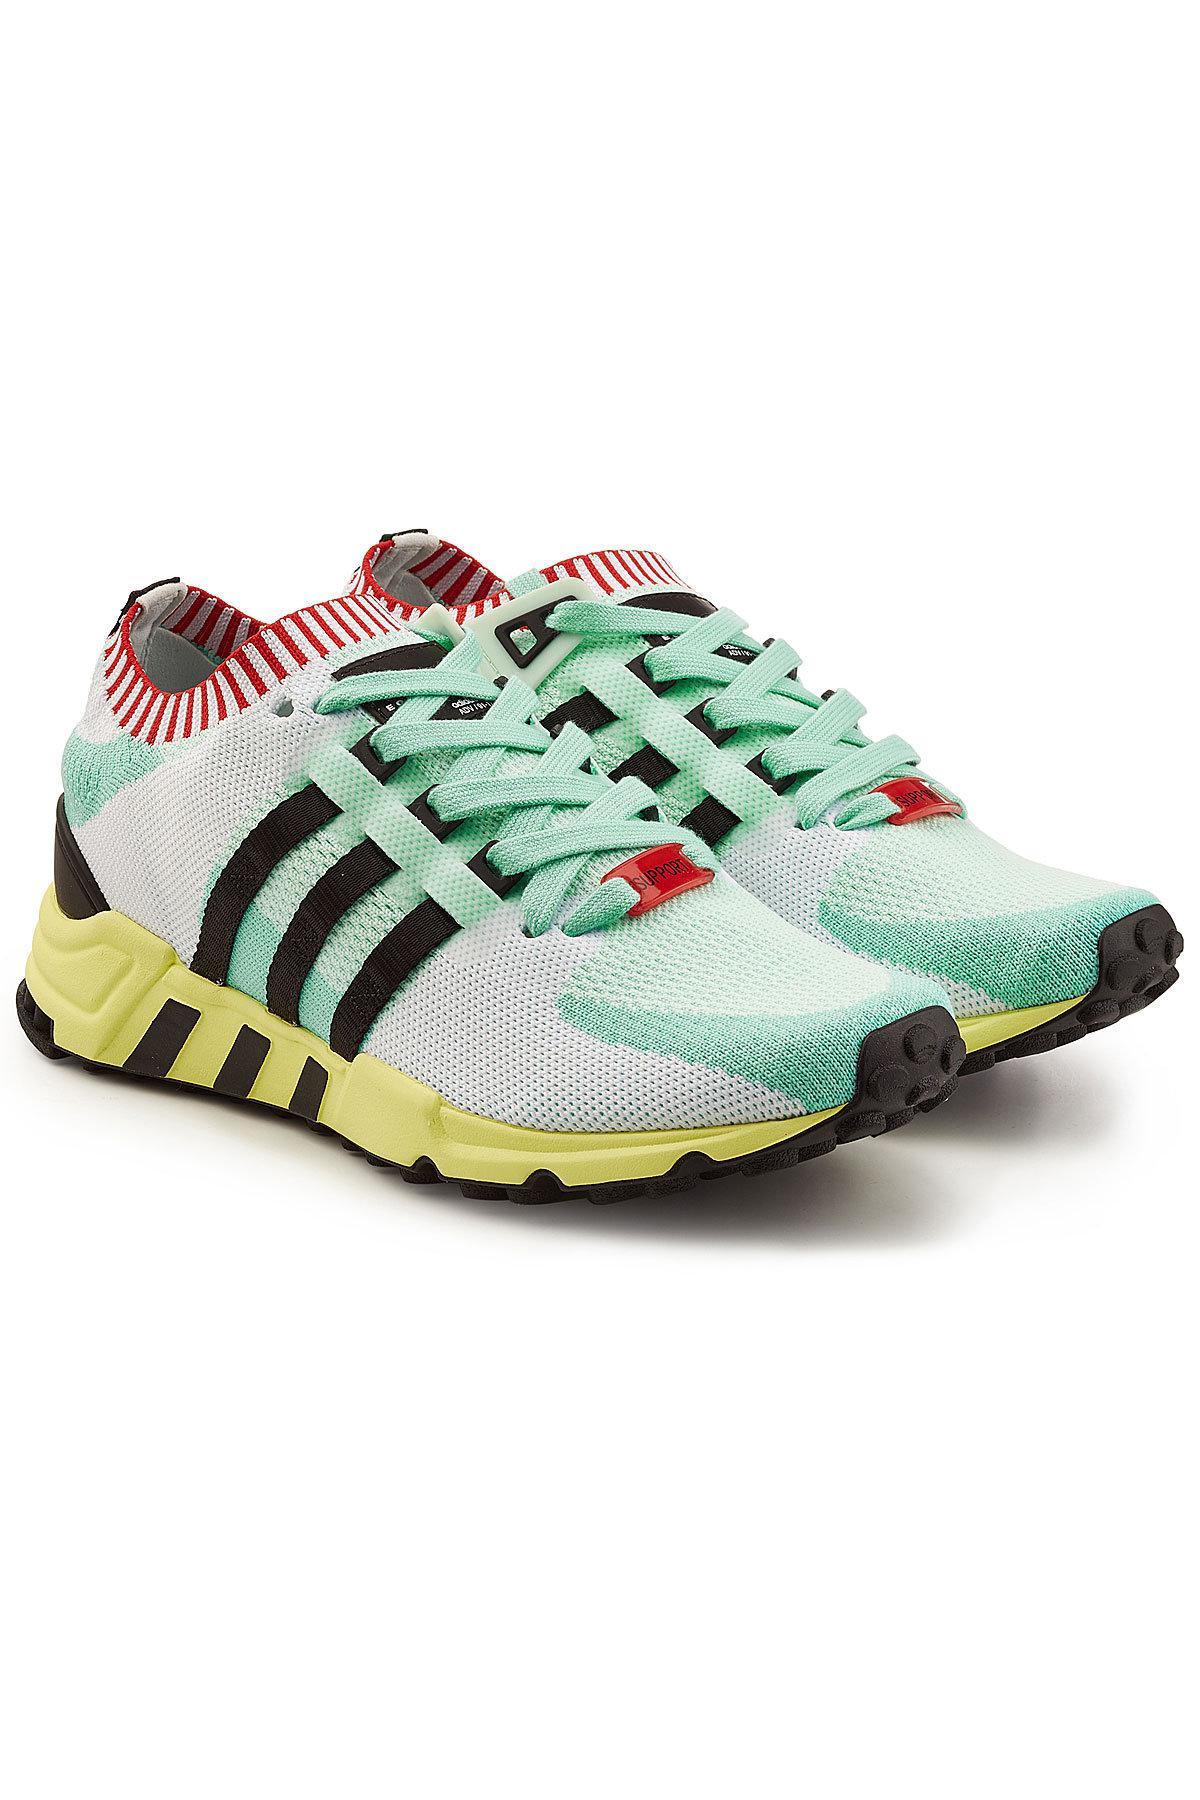 pretty nice 2e6f7 d1d0f Adidas Originals Eqt Support Refine Primeknit Sneakers in Gr